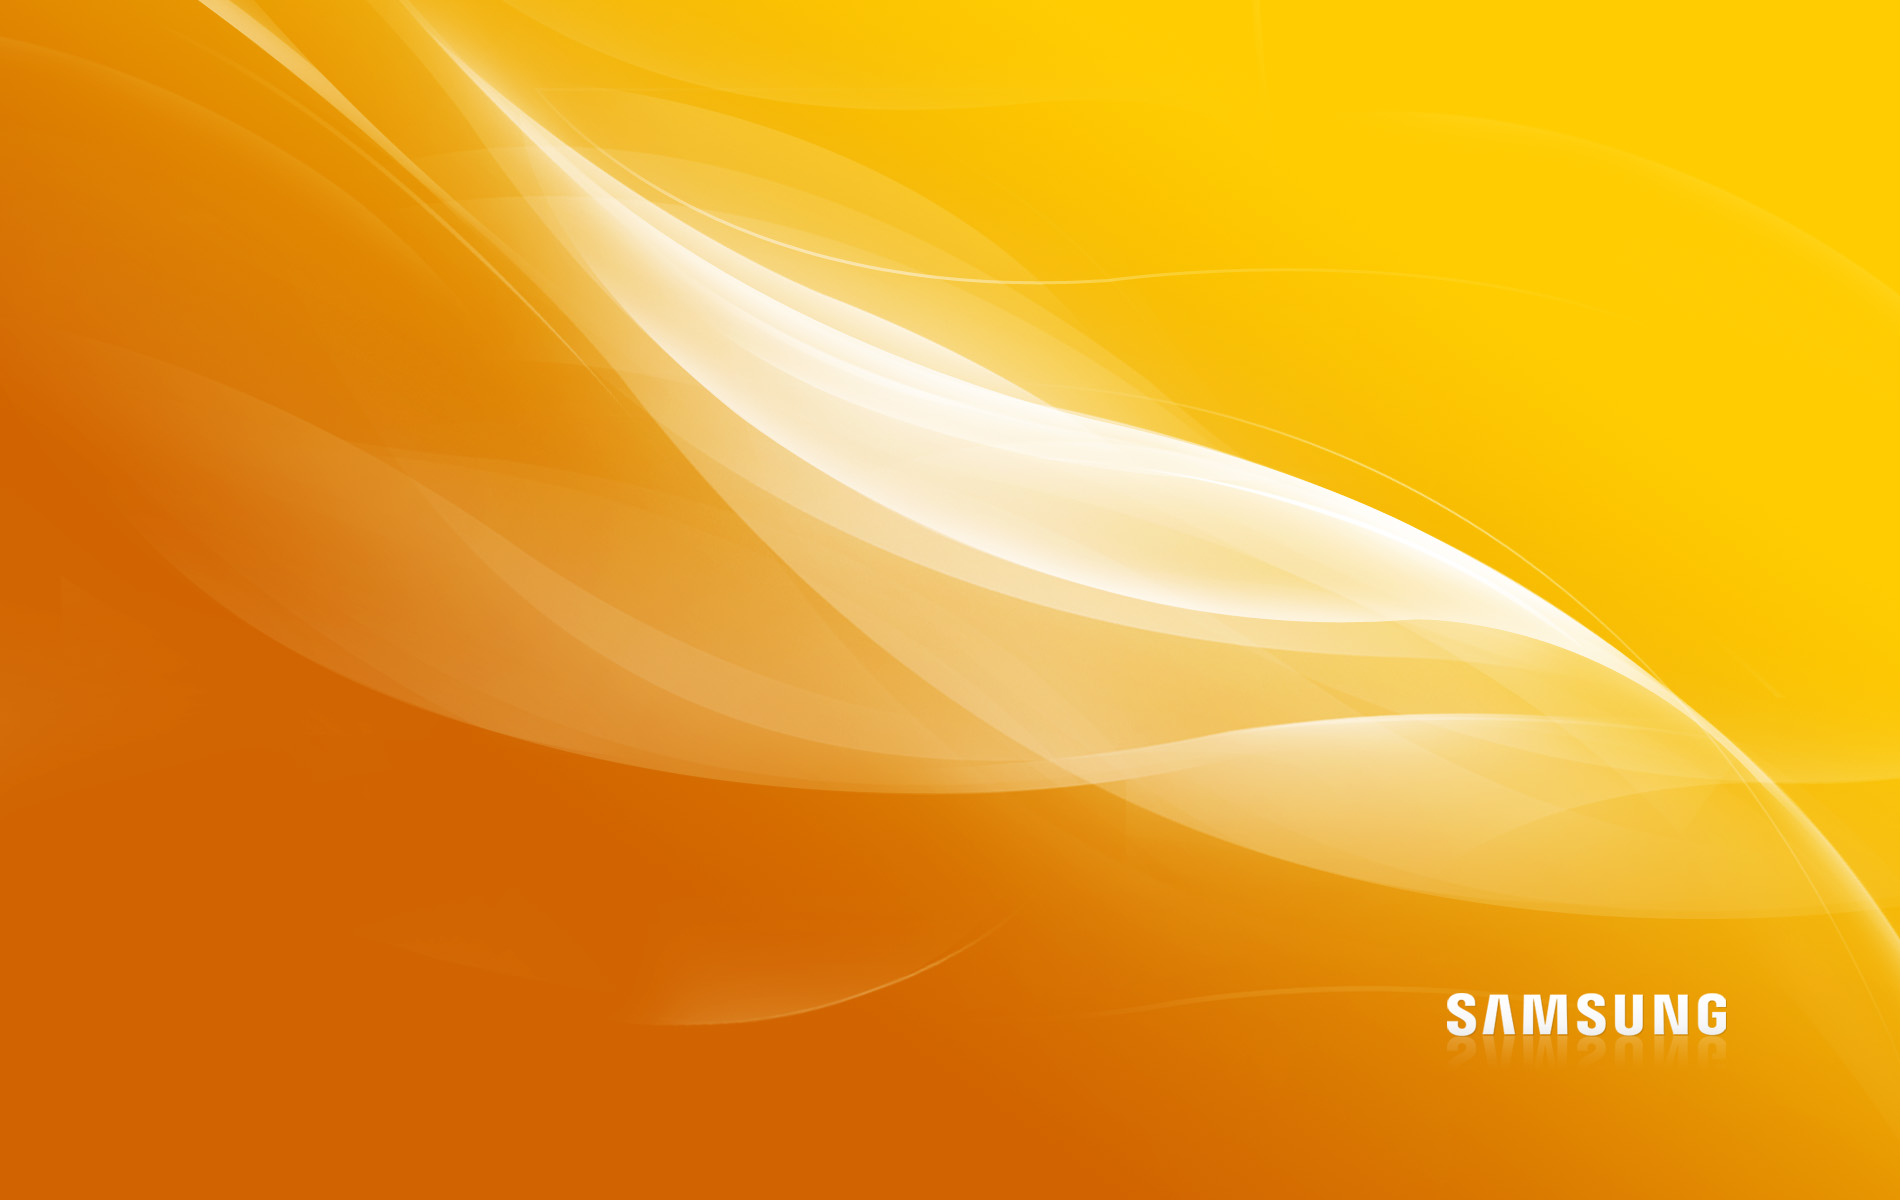 Samsung Wallpaper: Samsung Wallpaper Images